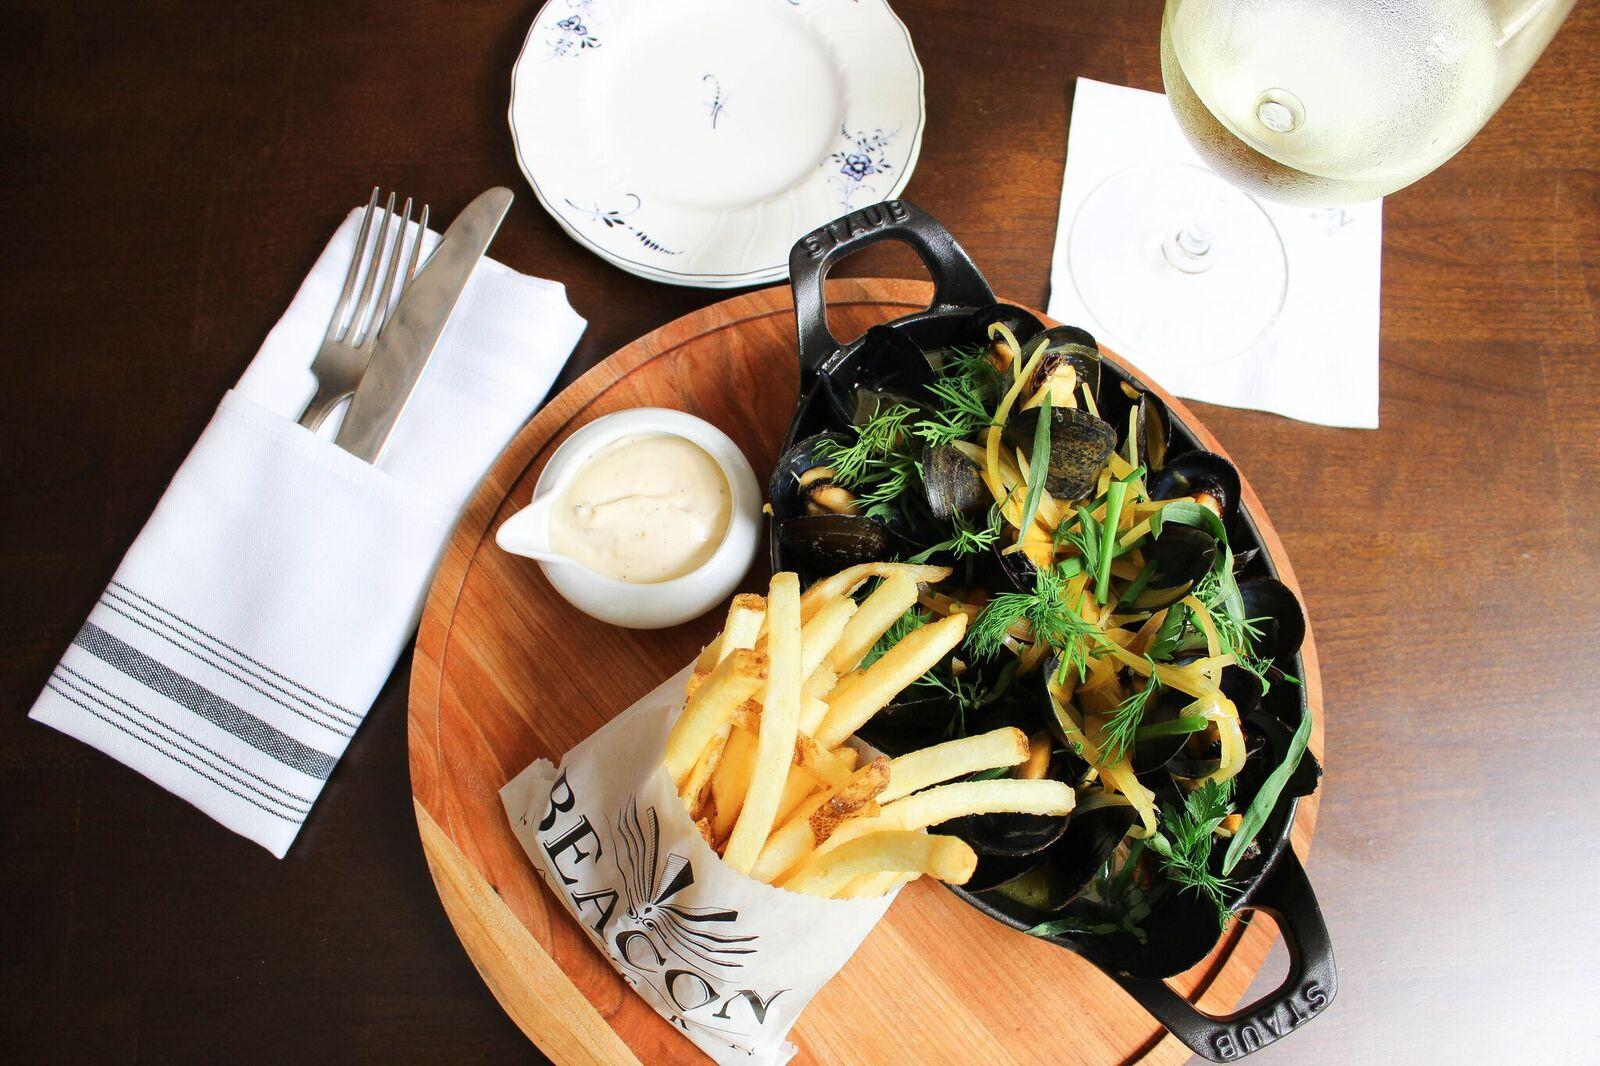 5Beacon_Tavern_mussels_frites_060116_KW.jpg